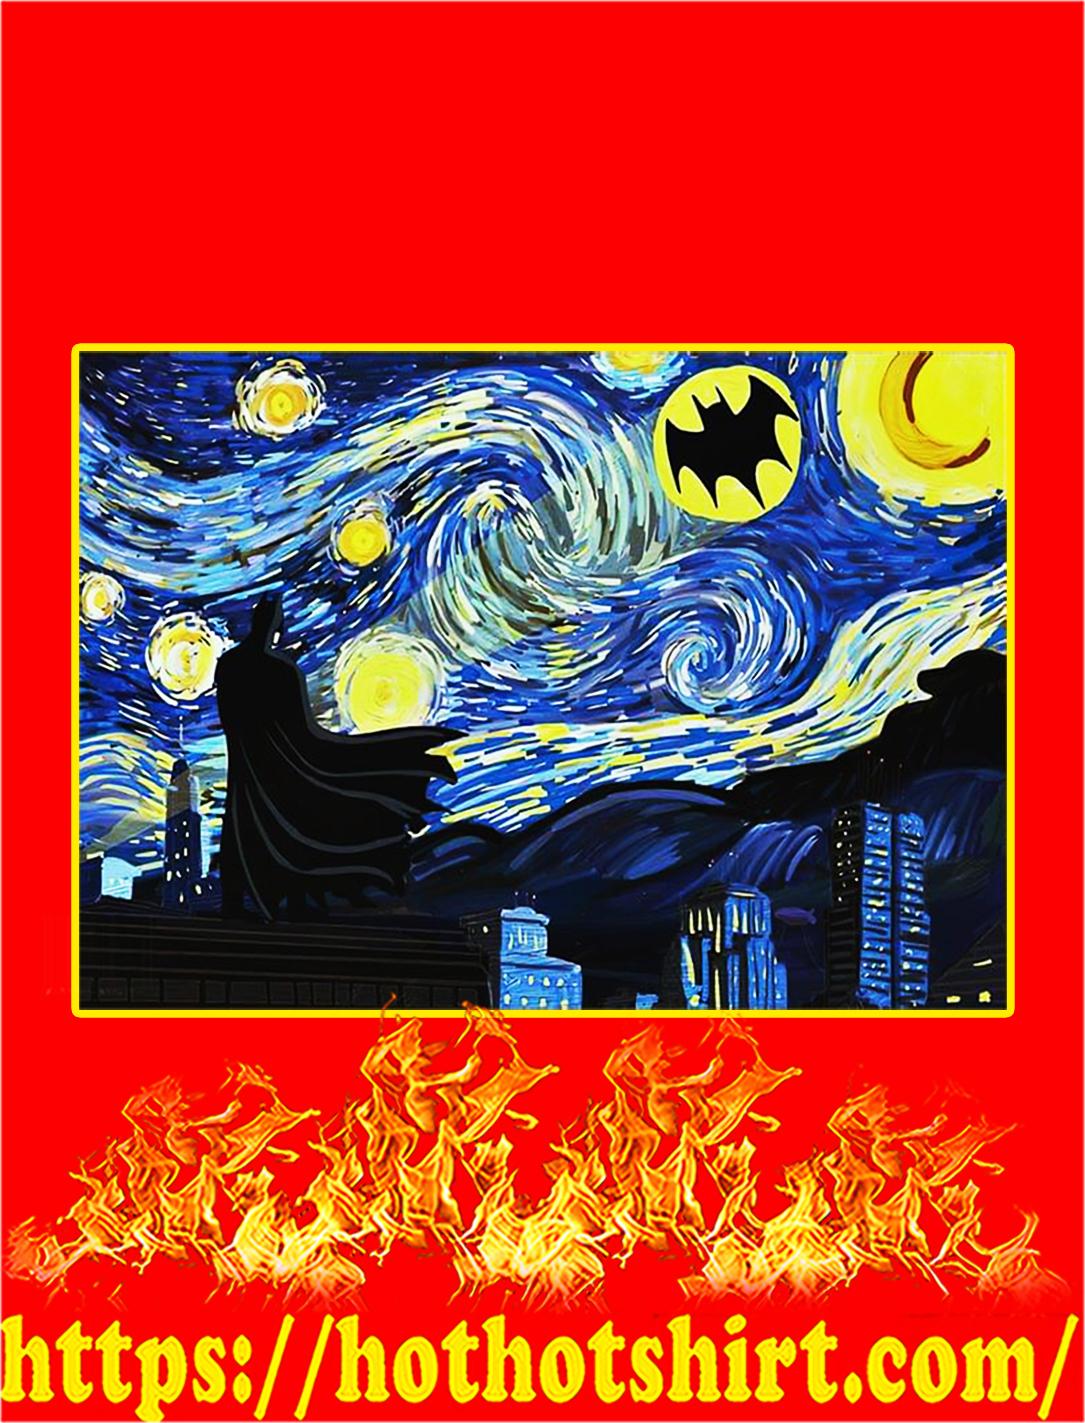 Batman starry night van gogh poster - A1